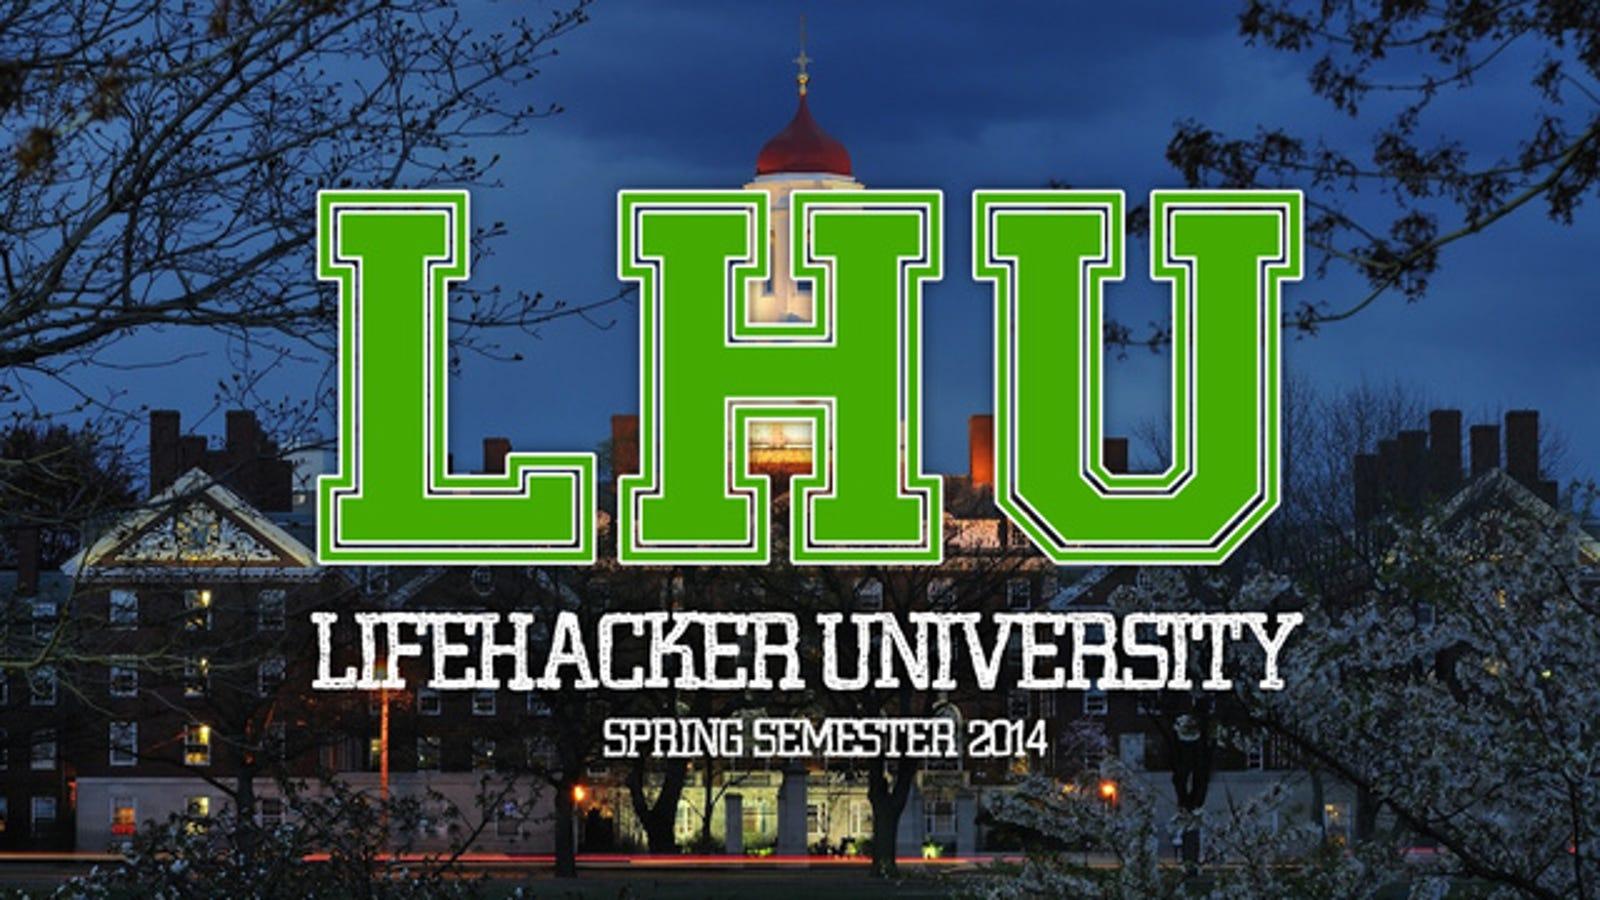 Plan Your Free Online Education at Lifehacker U: Spring Semester 2014